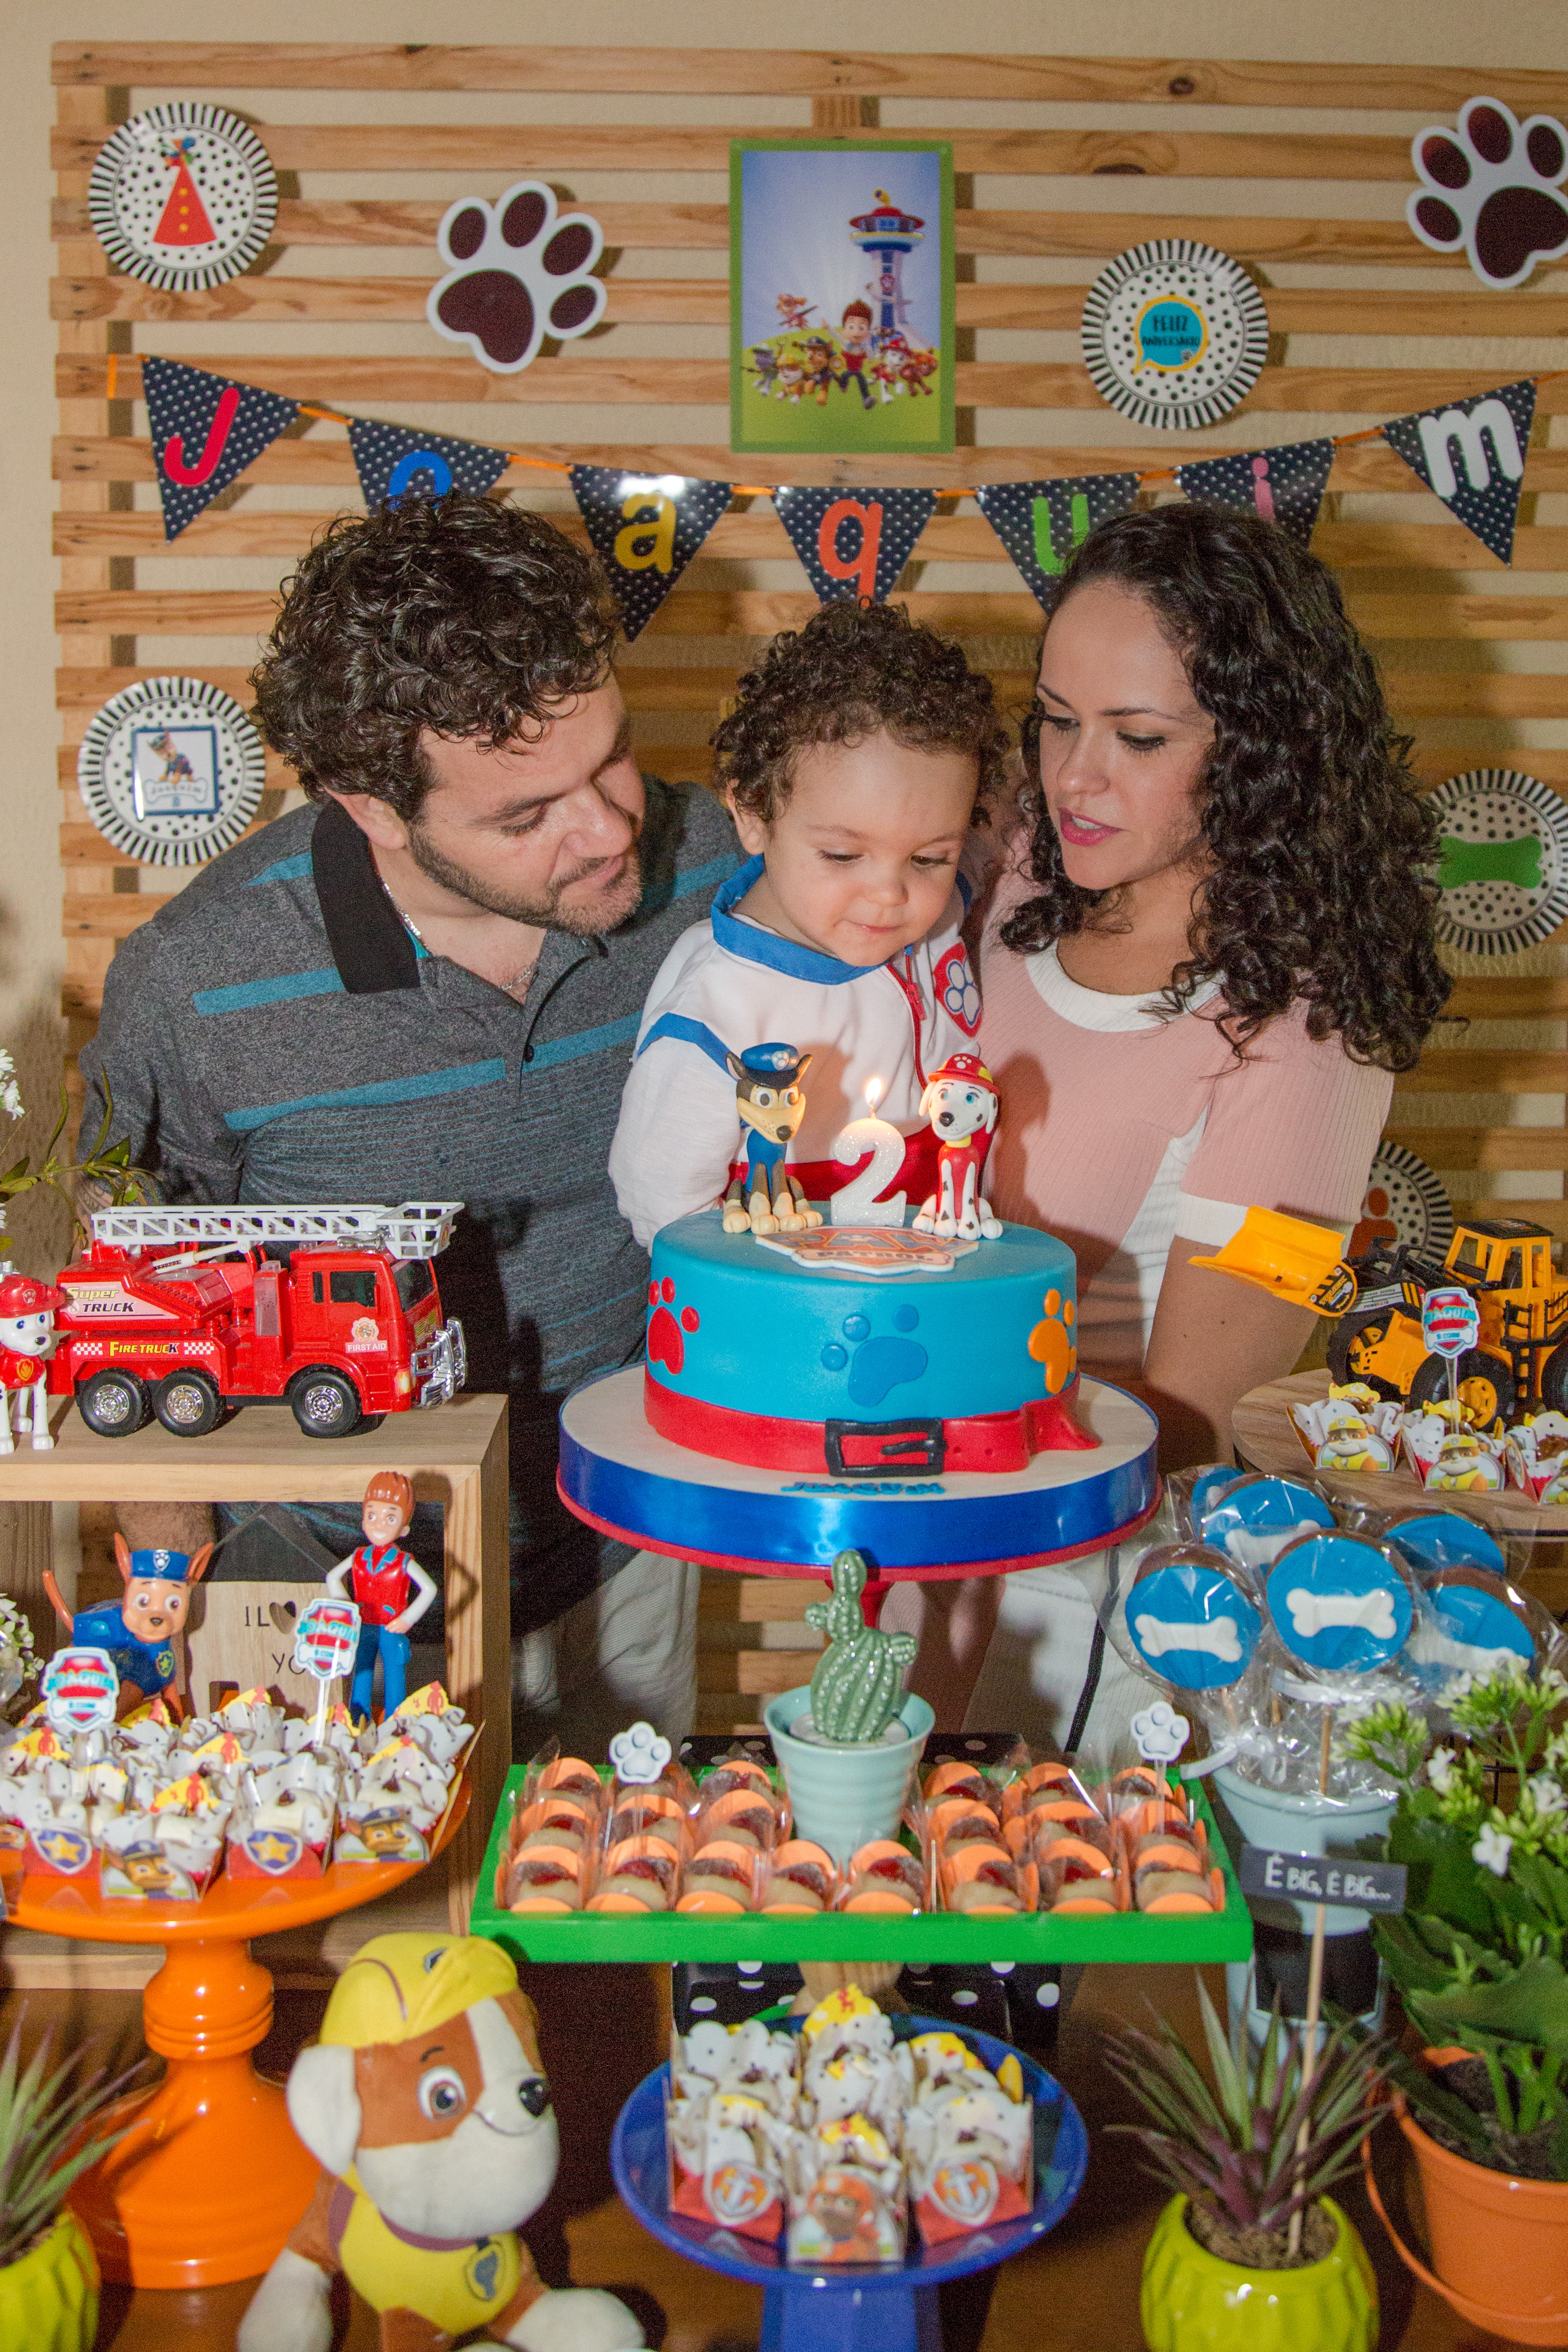 Festa‐Infantil‐Florianopolis‐Ana‐Marmo‐FotografiaFesta‐Infantil‐Florianopolis‐Ana‐Marmo‐Fotografia191A0801